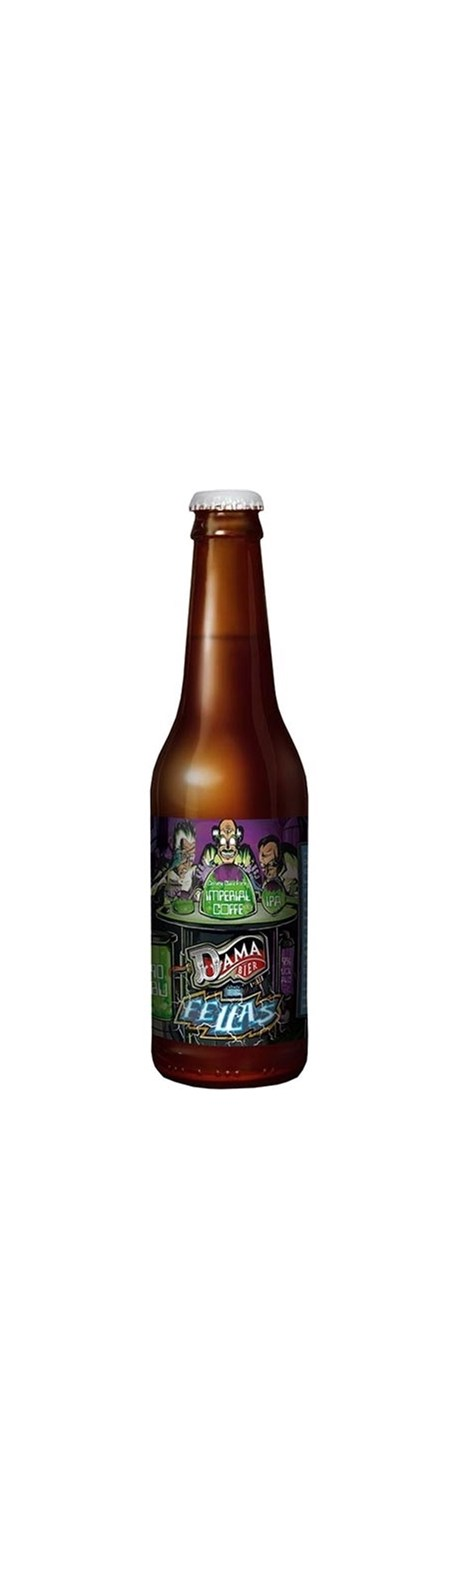 Dama Bier Fellas